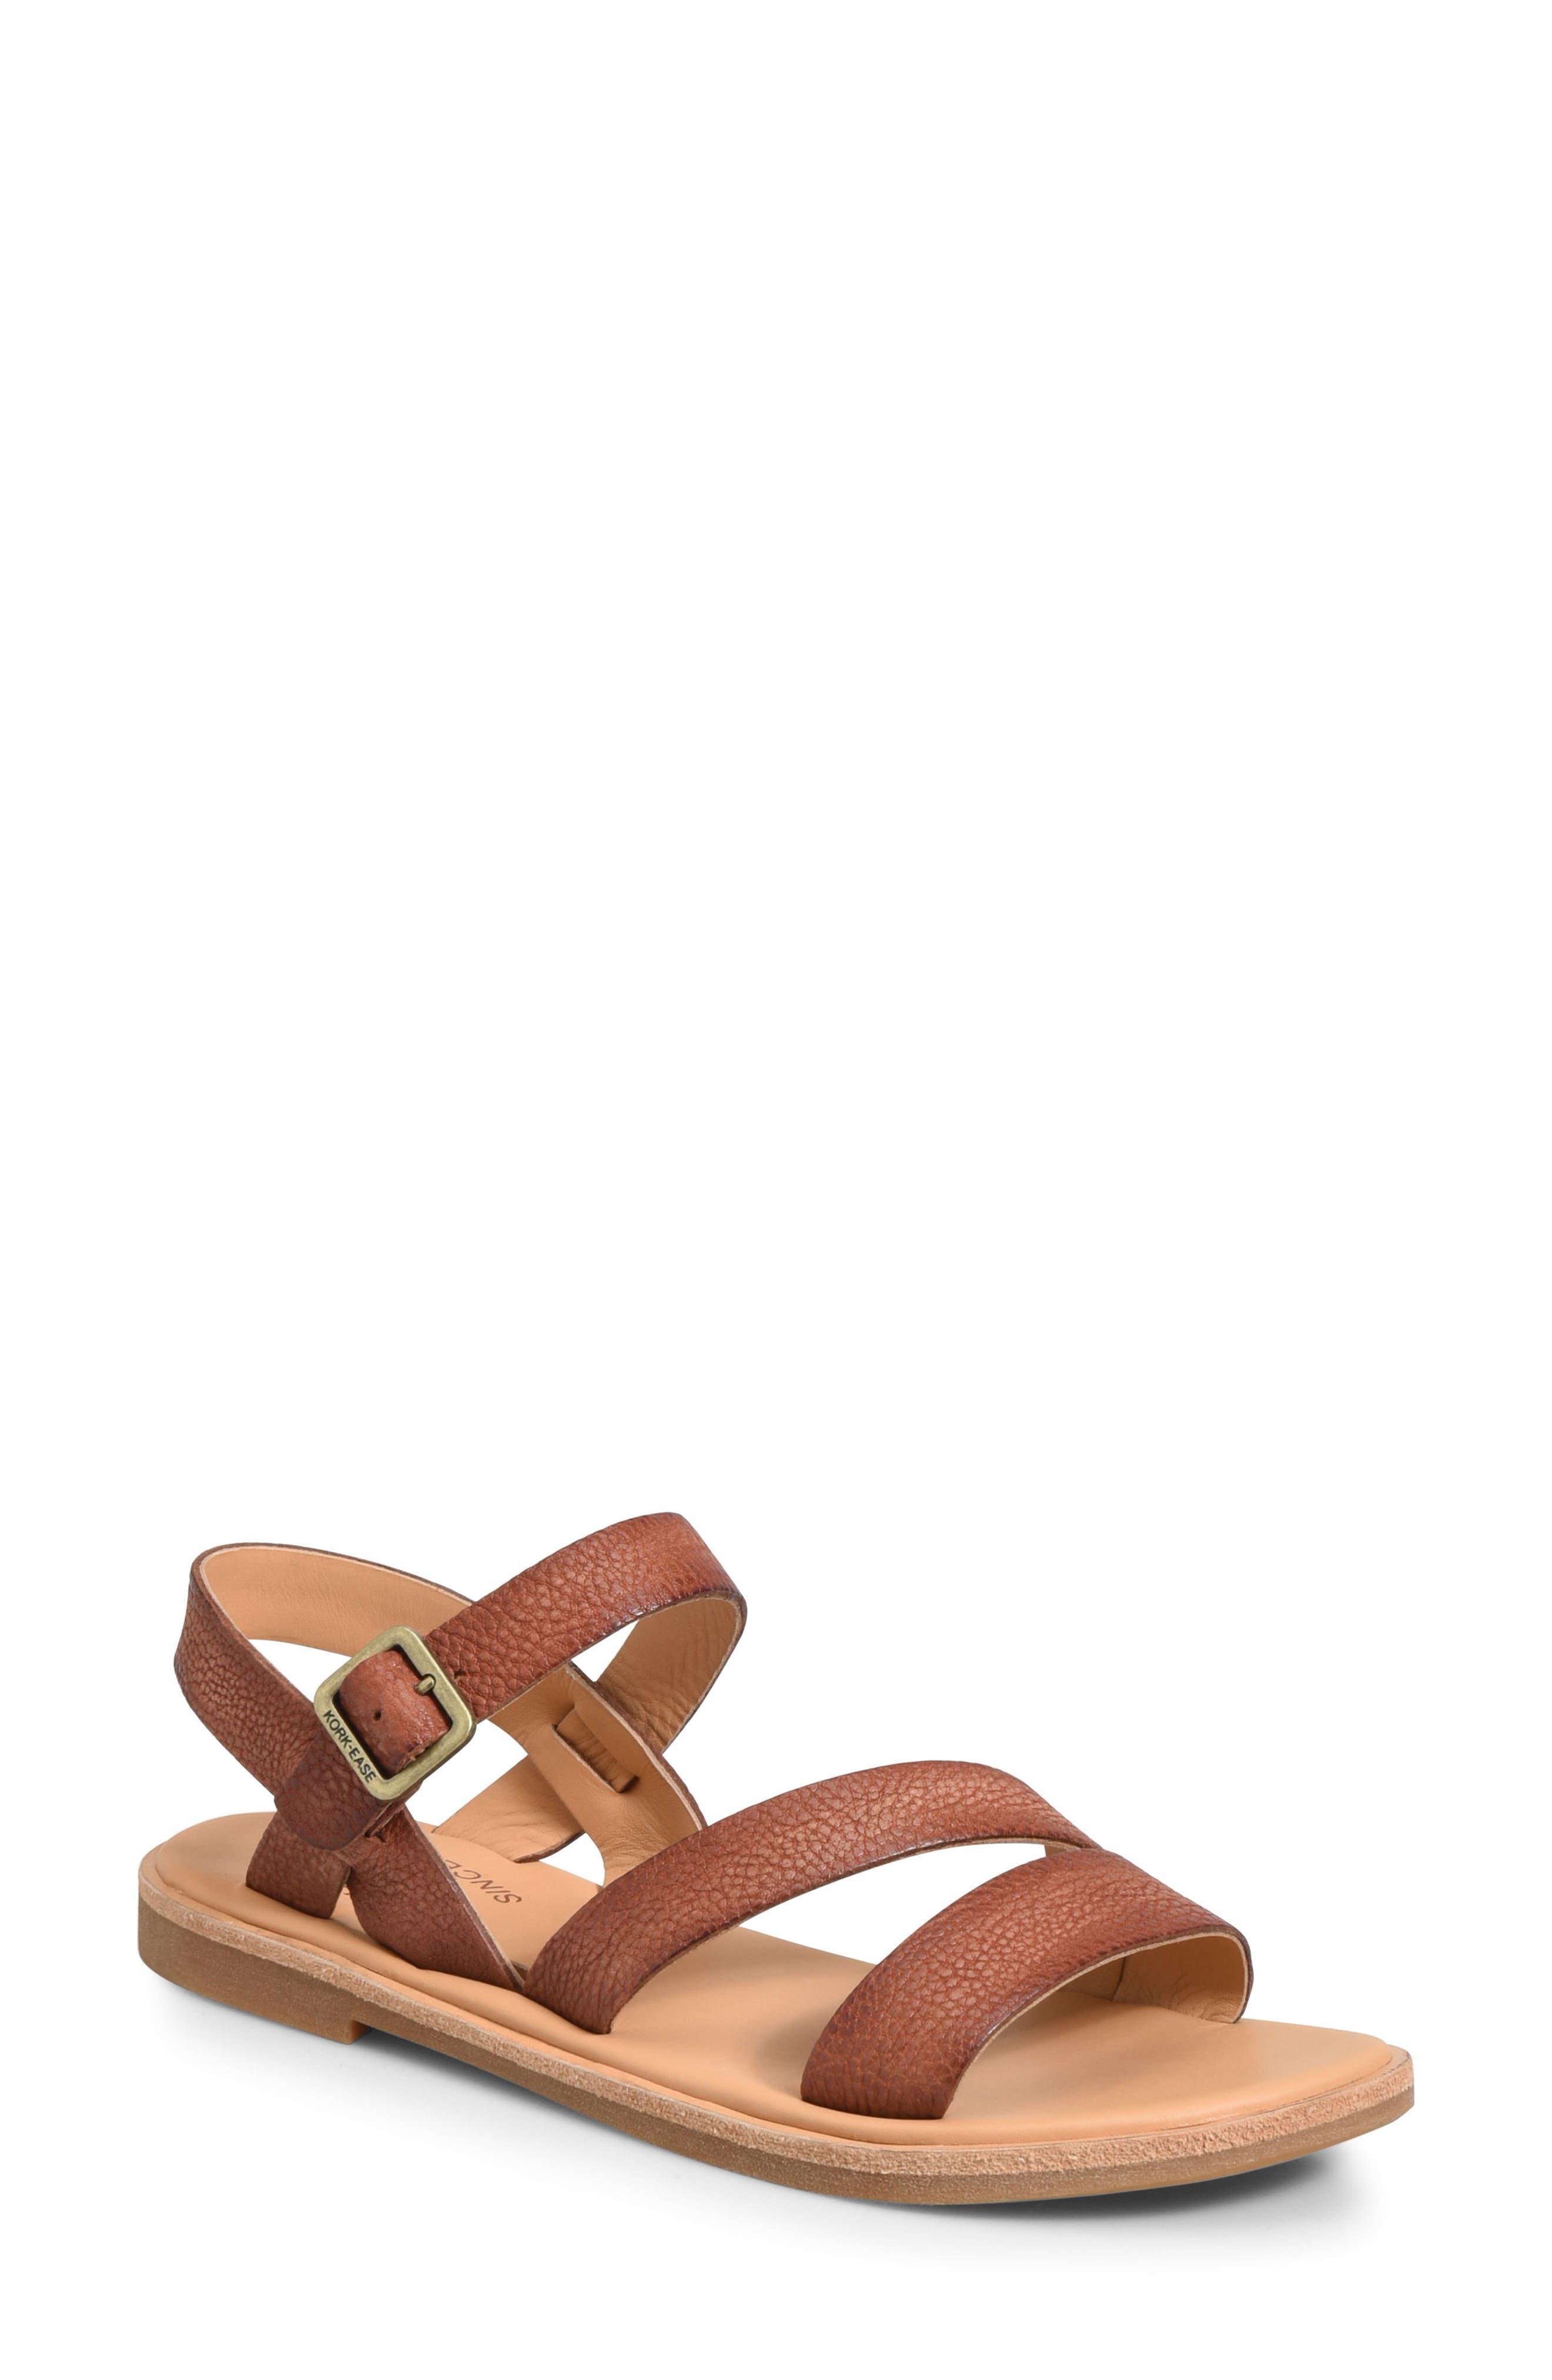 Nogales Sandal,                             Main thumbnail 1, color,                             Brown Leather